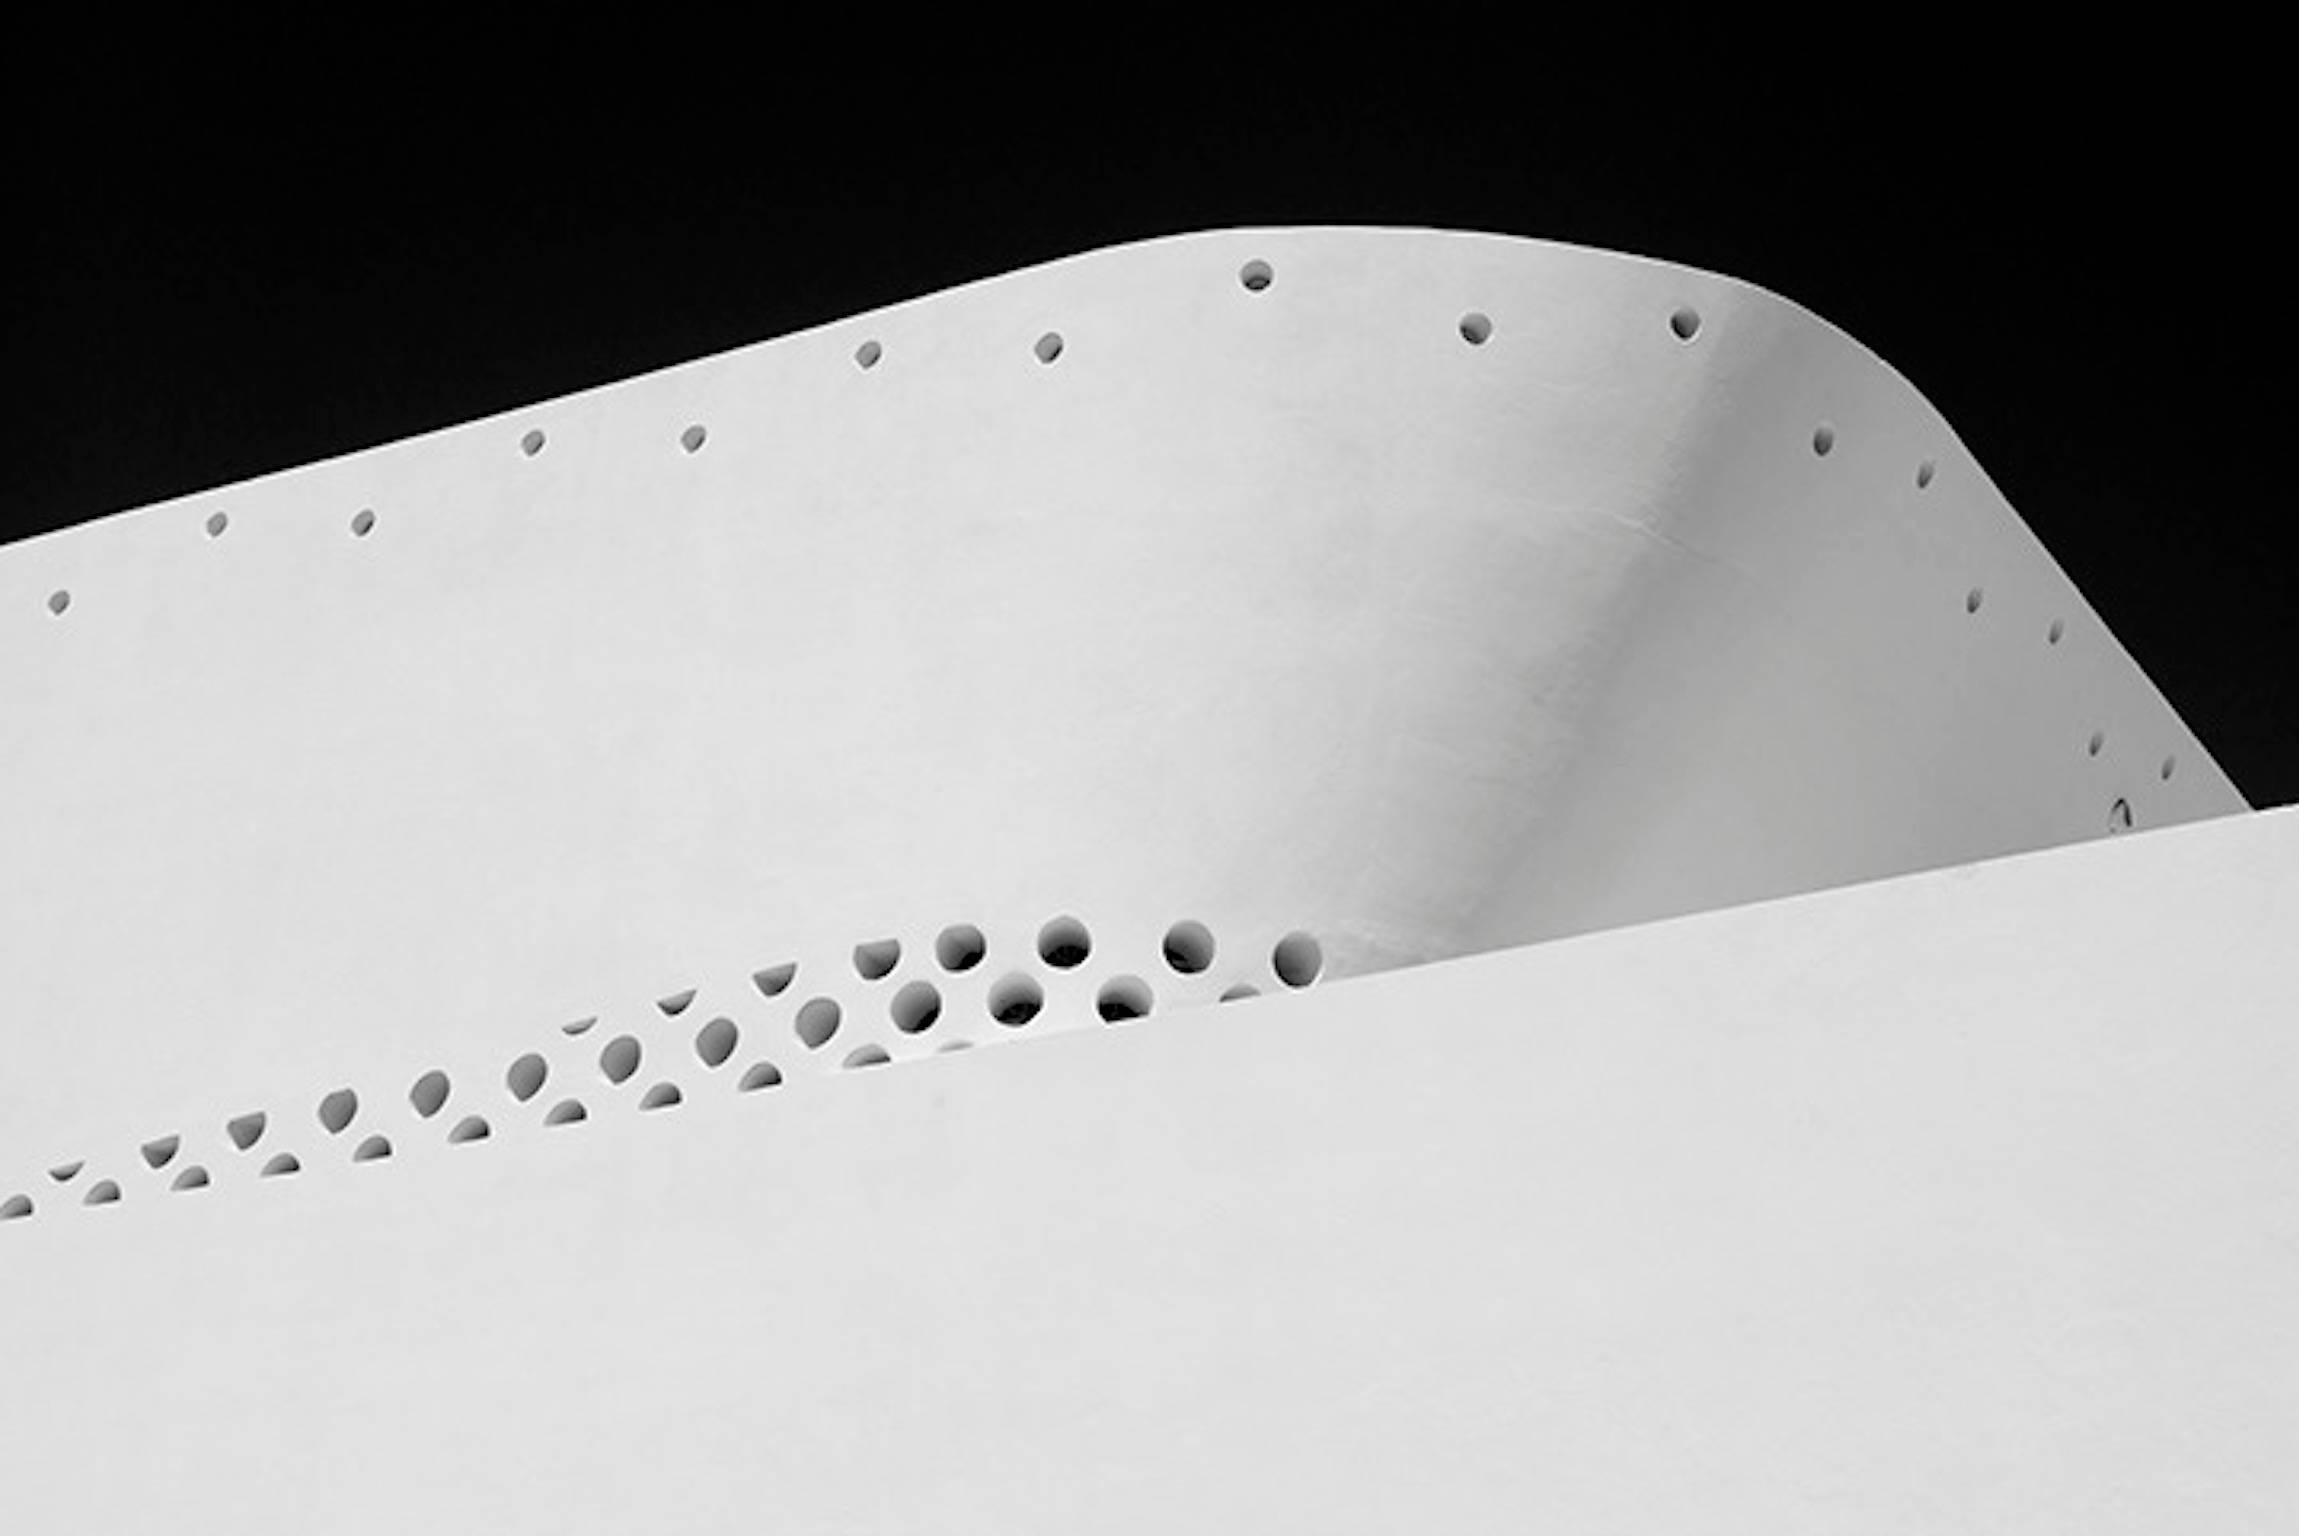 Miami Circles 1. Black and White Architectural Photograph, 2014